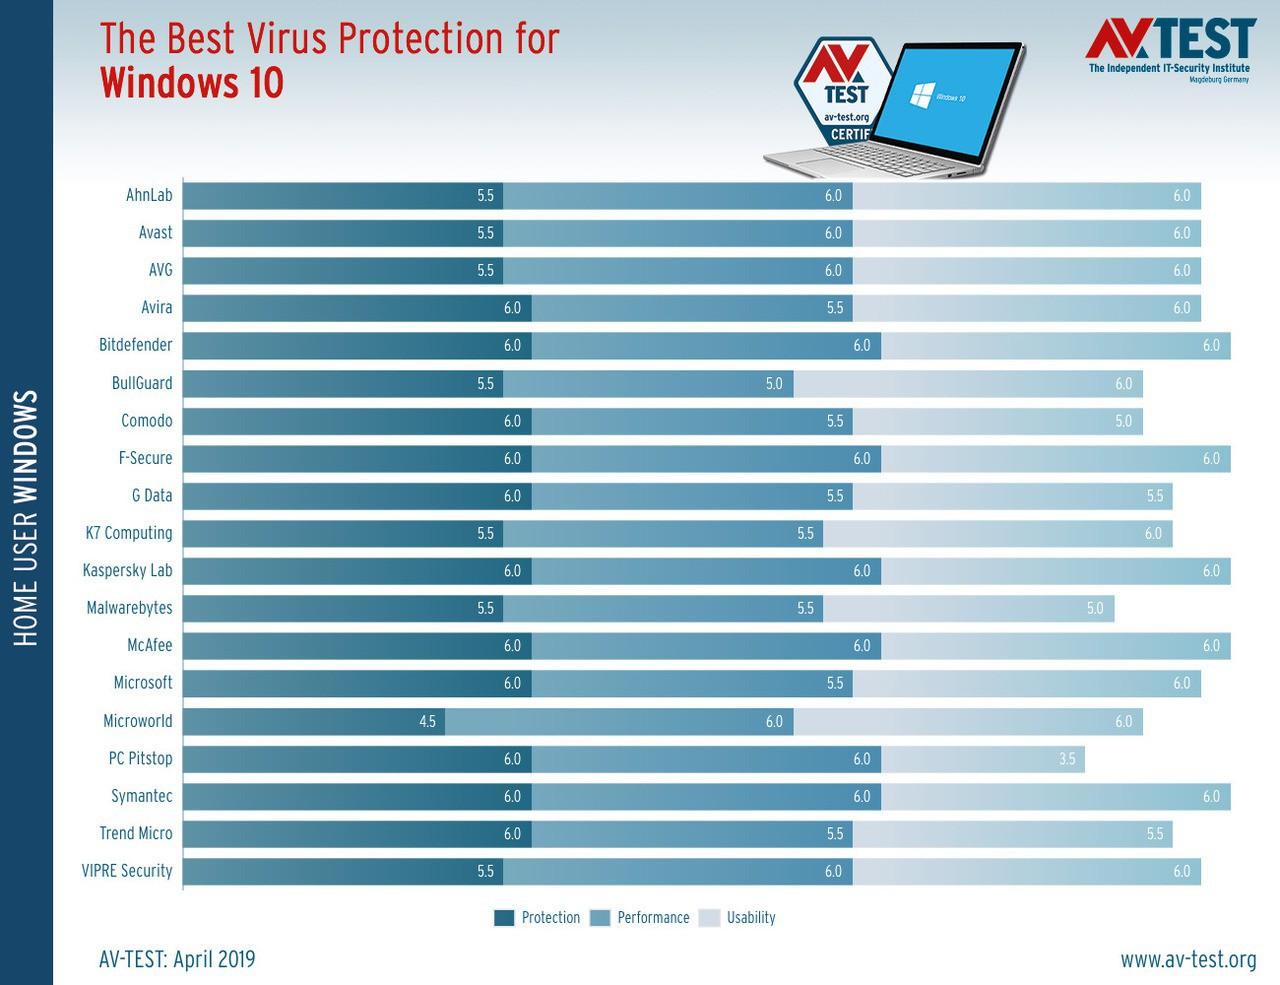 Best antivirus for windows 10 march april 2019 anti malware tests 526209 2